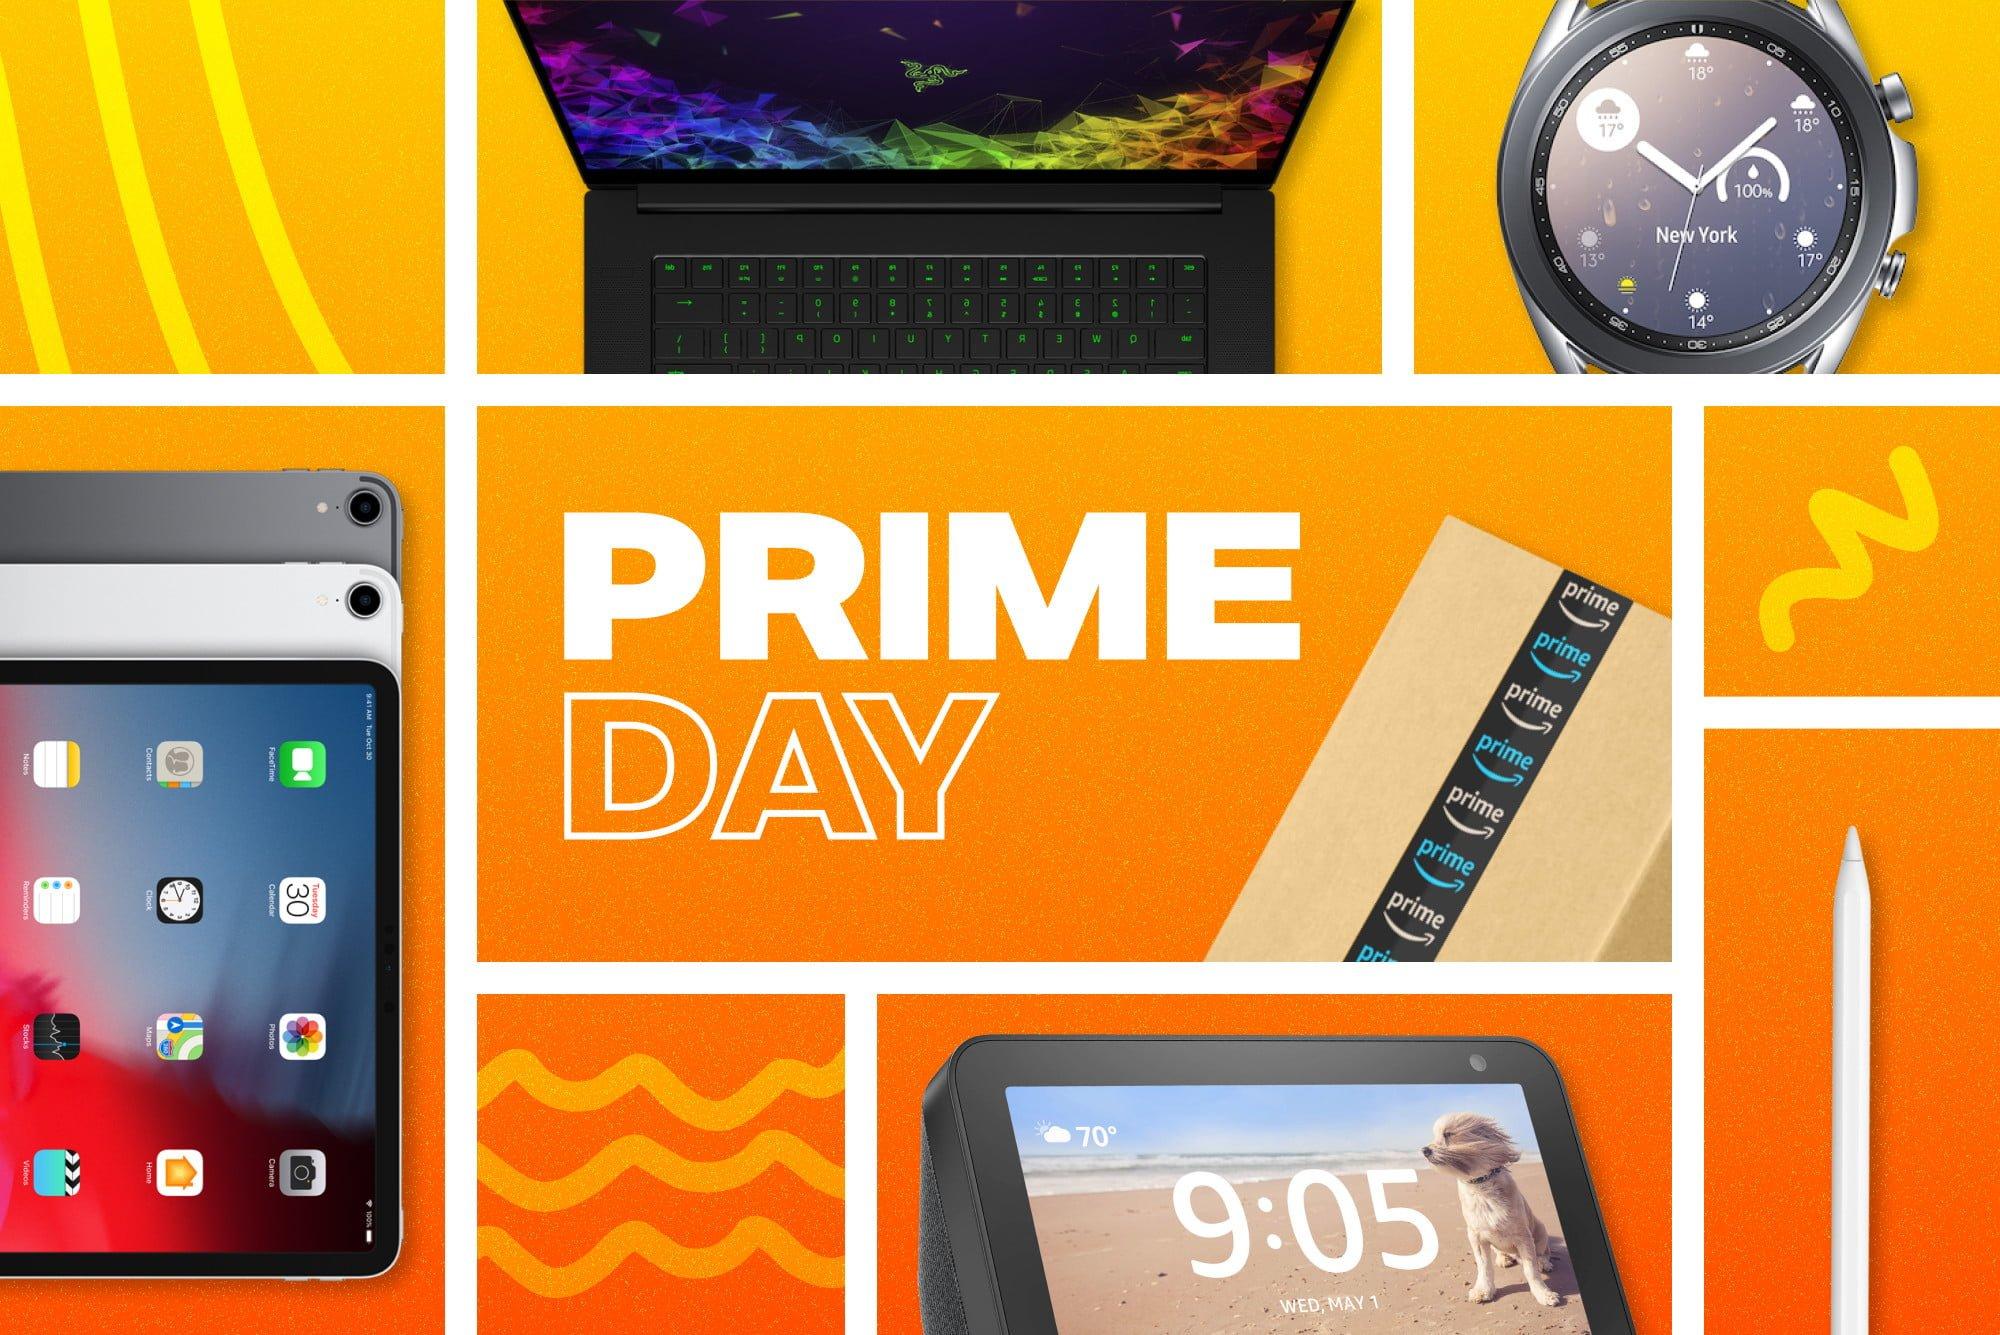 Best Prime Day Deals 2021: The best Amazon deals today